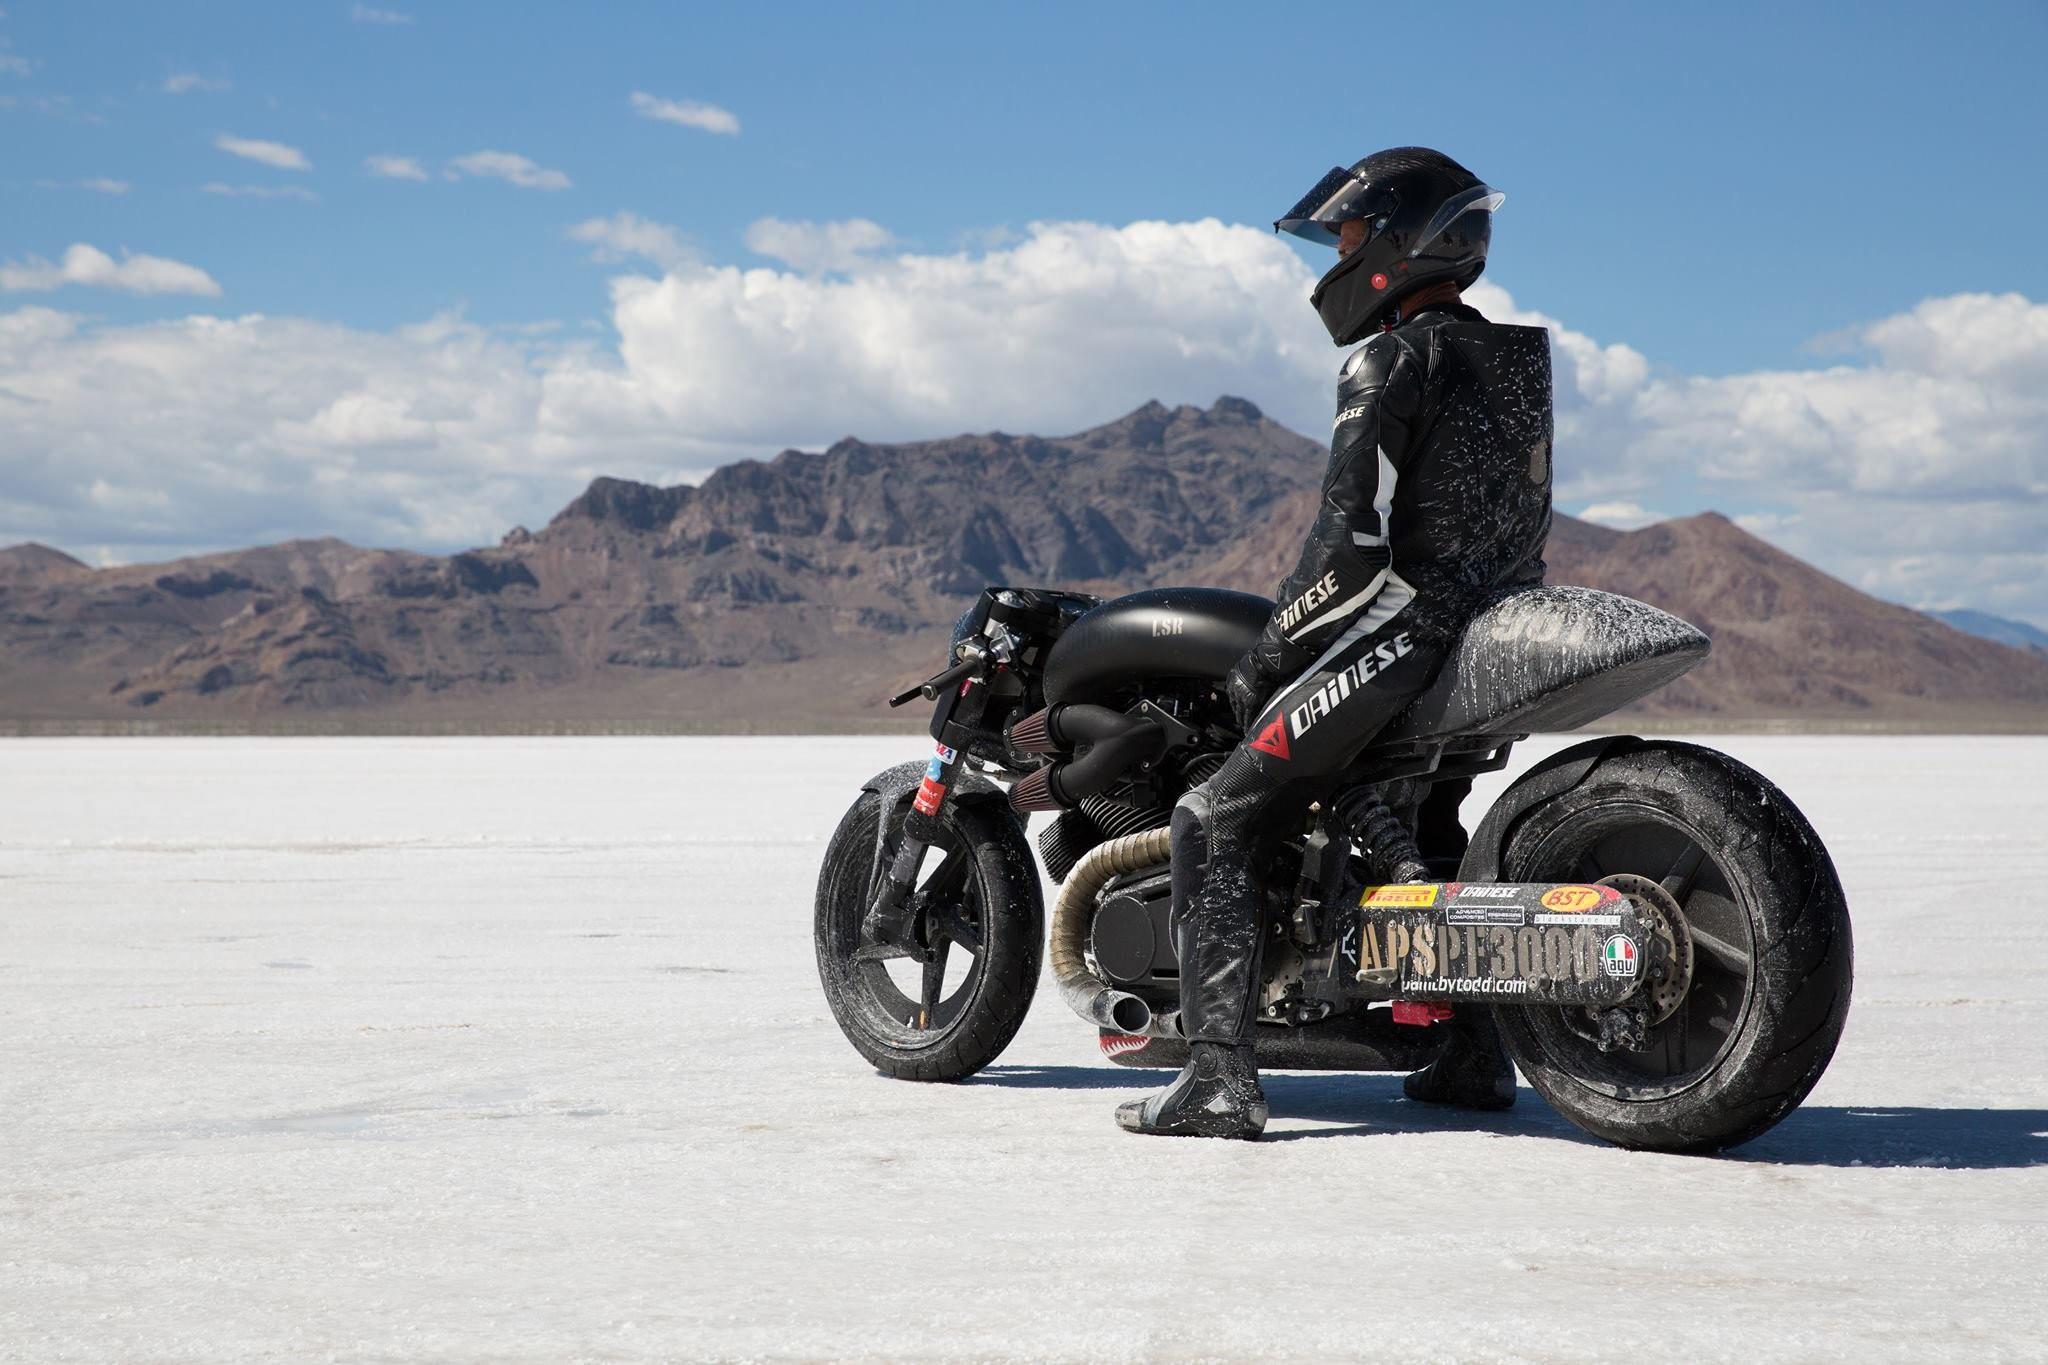 CONFEDERATE MOTORCYCLE superbike custom bike motorbike race racing hot rod  rods speedster cafe racer wallpaper     742664   WallpaperUP